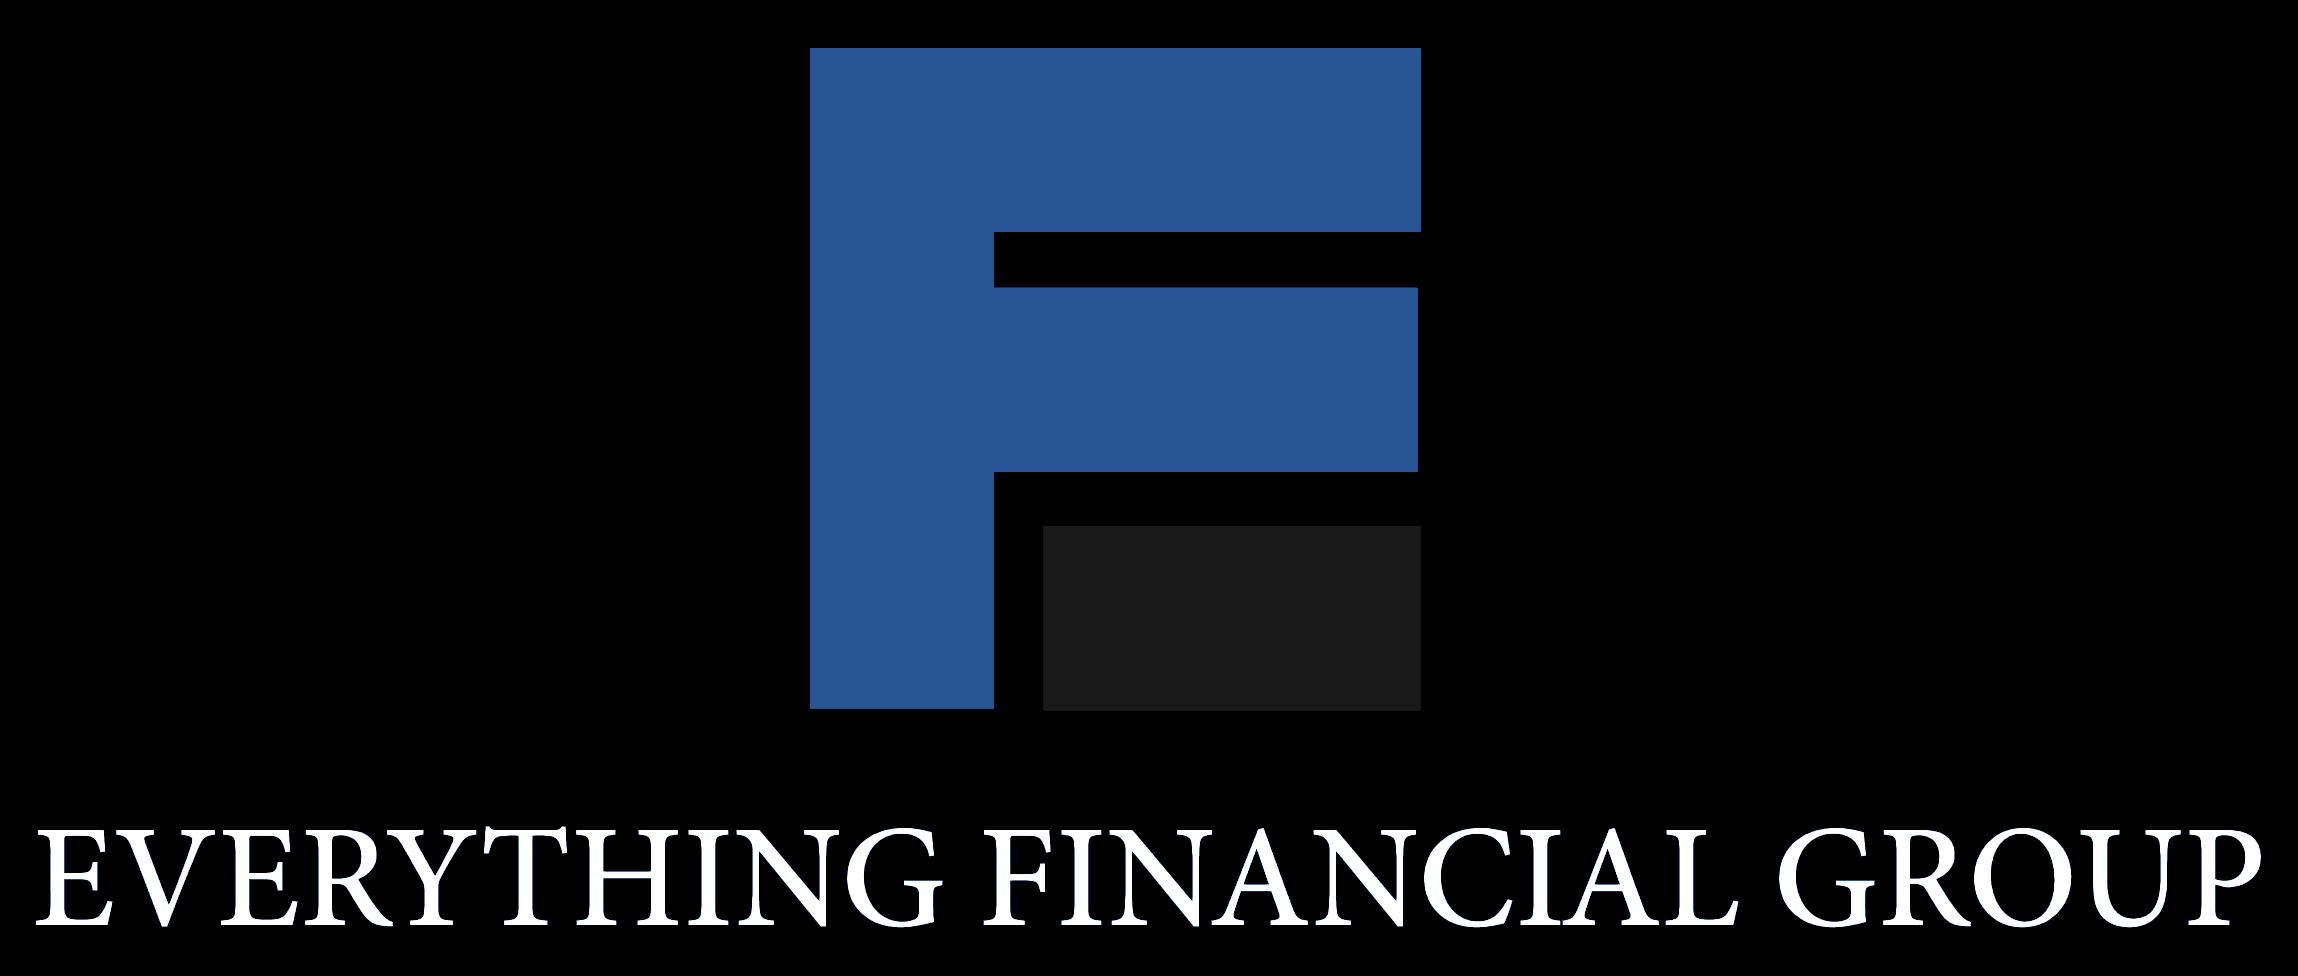 EFG logo Big White.png